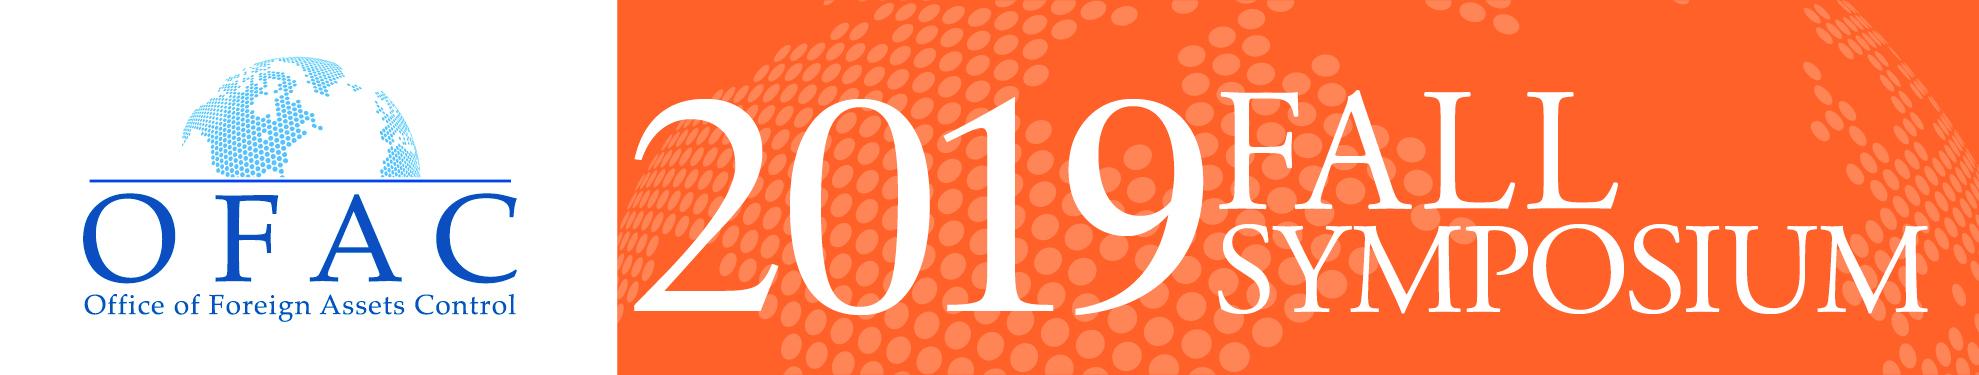 OFAC 2019 Fall Symposium